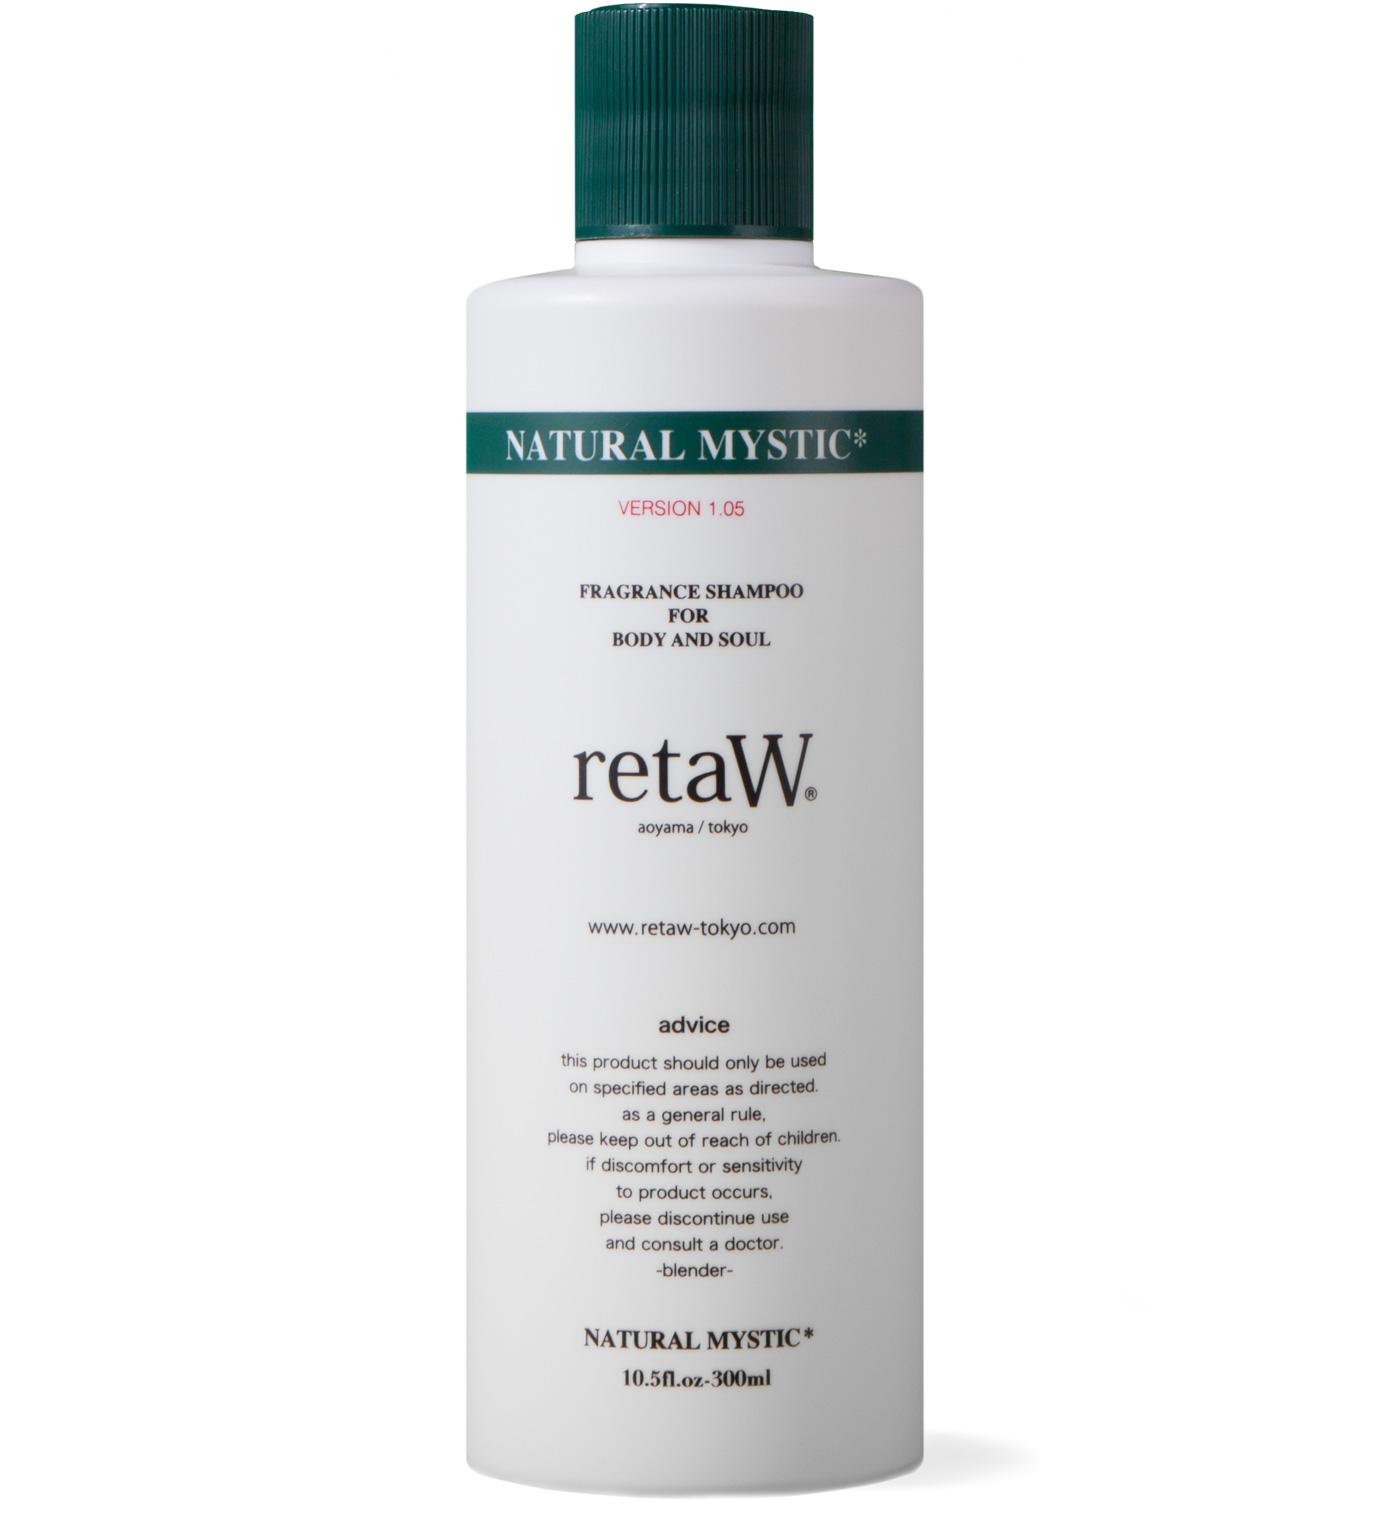 retaW Natural Mystic Fragrance Body Shampoo